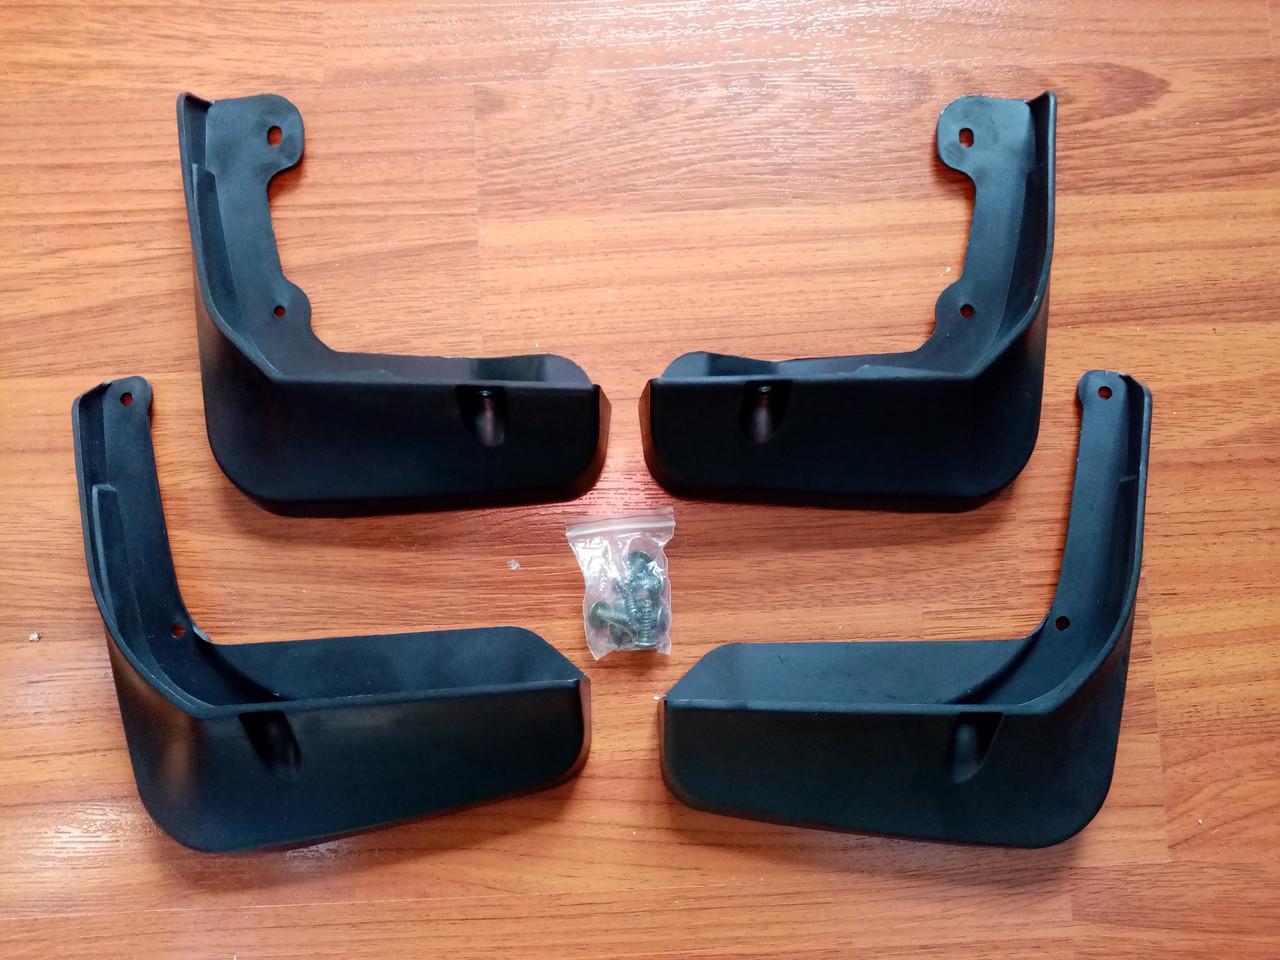 Комплект брызговиков 4 шт. на TOYOTA CAMRY V50  55 кузов 2016-